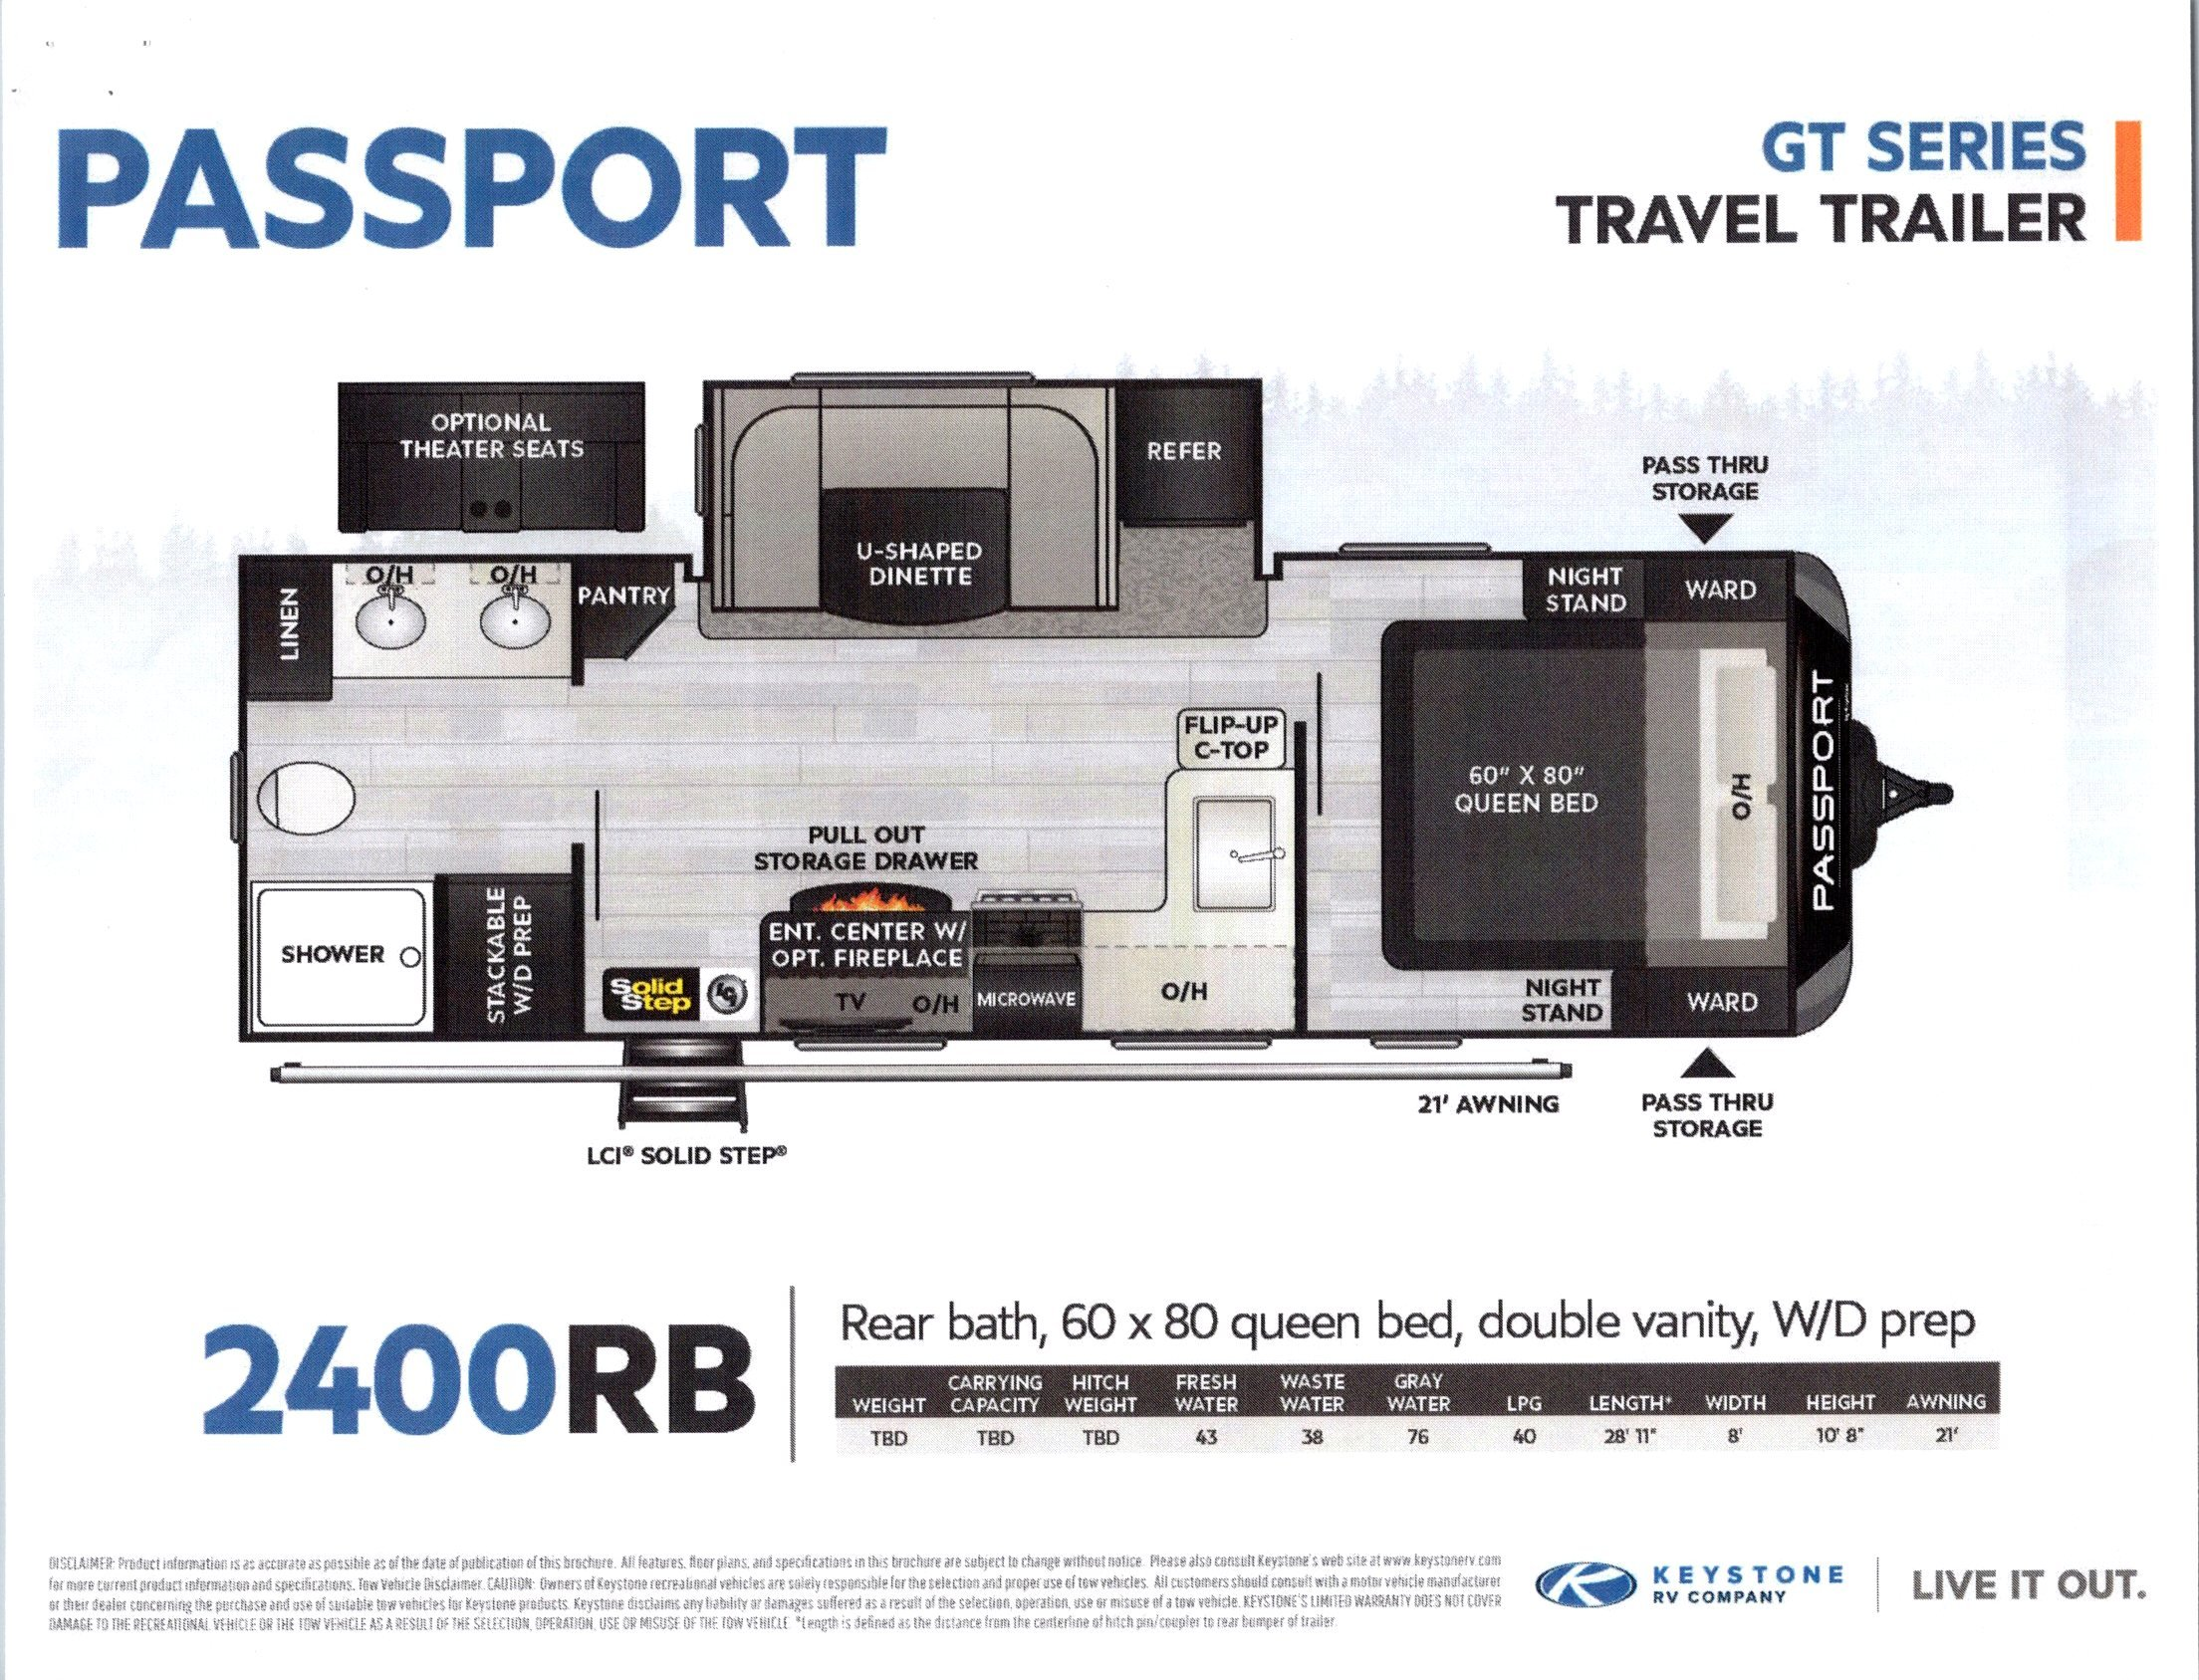 2021 Passport 2400RB GT Series